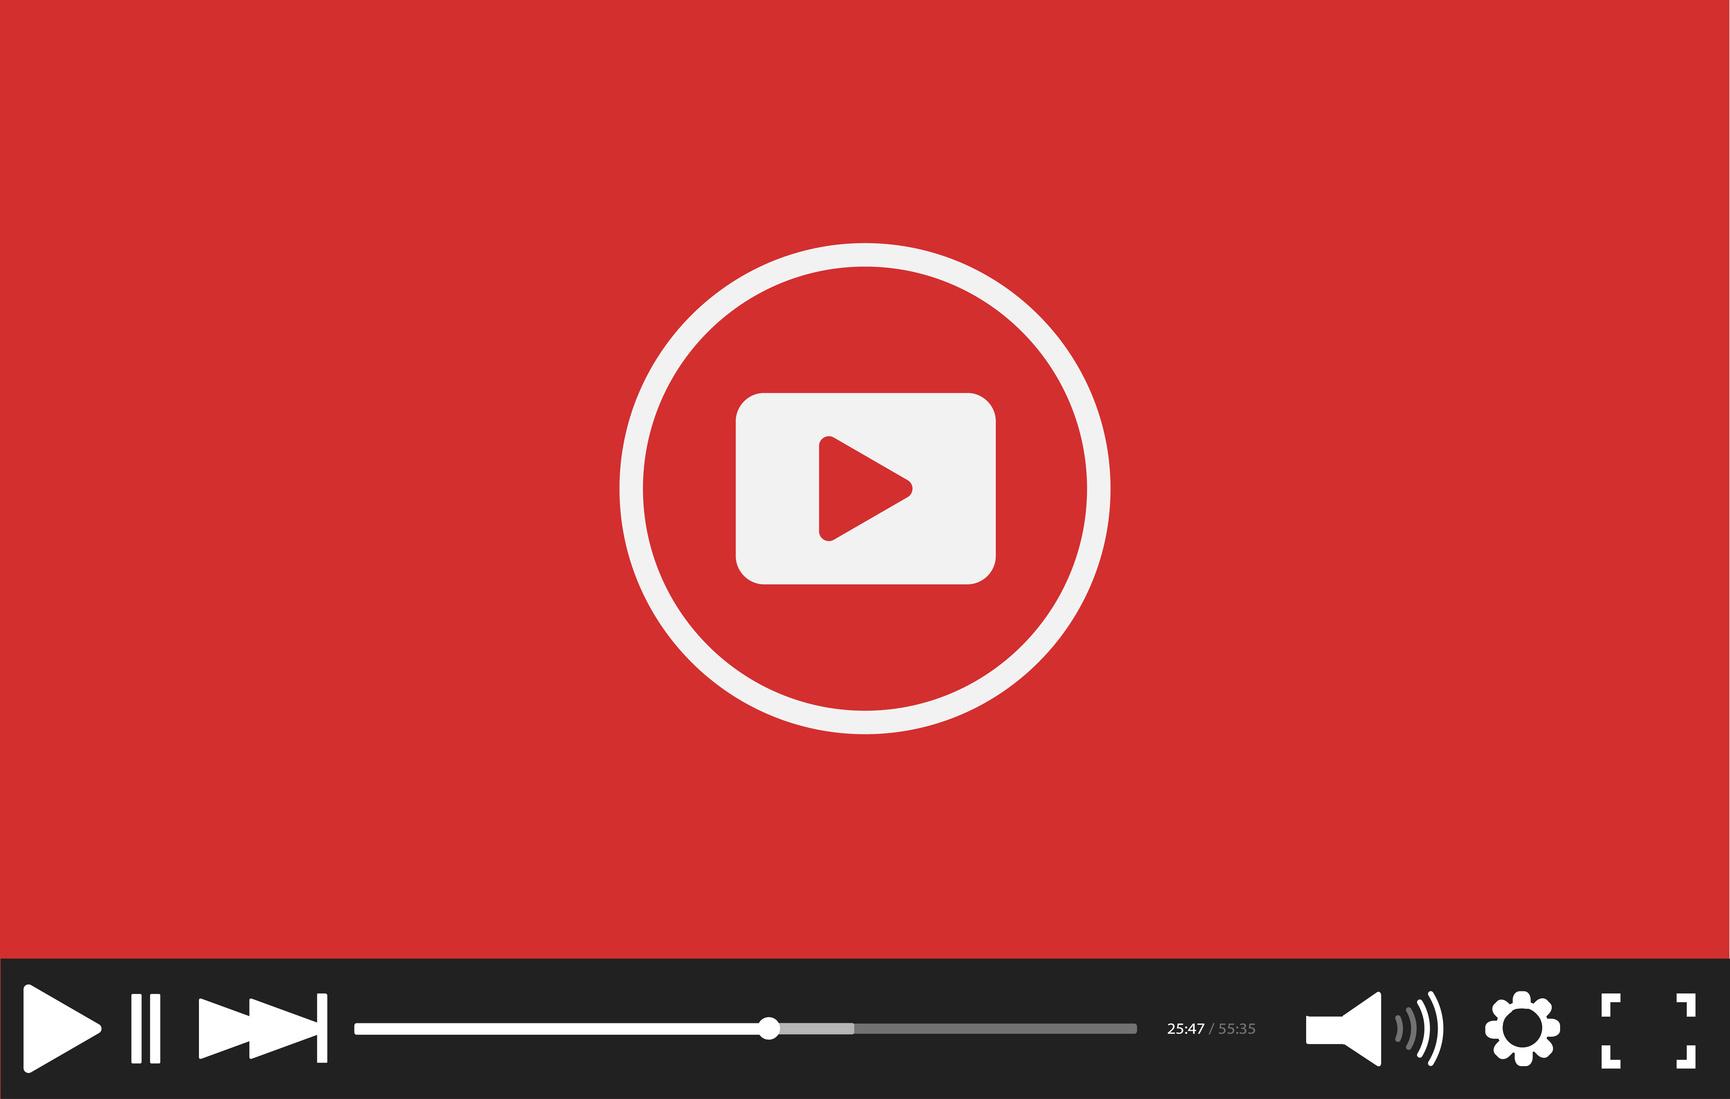 Videos play